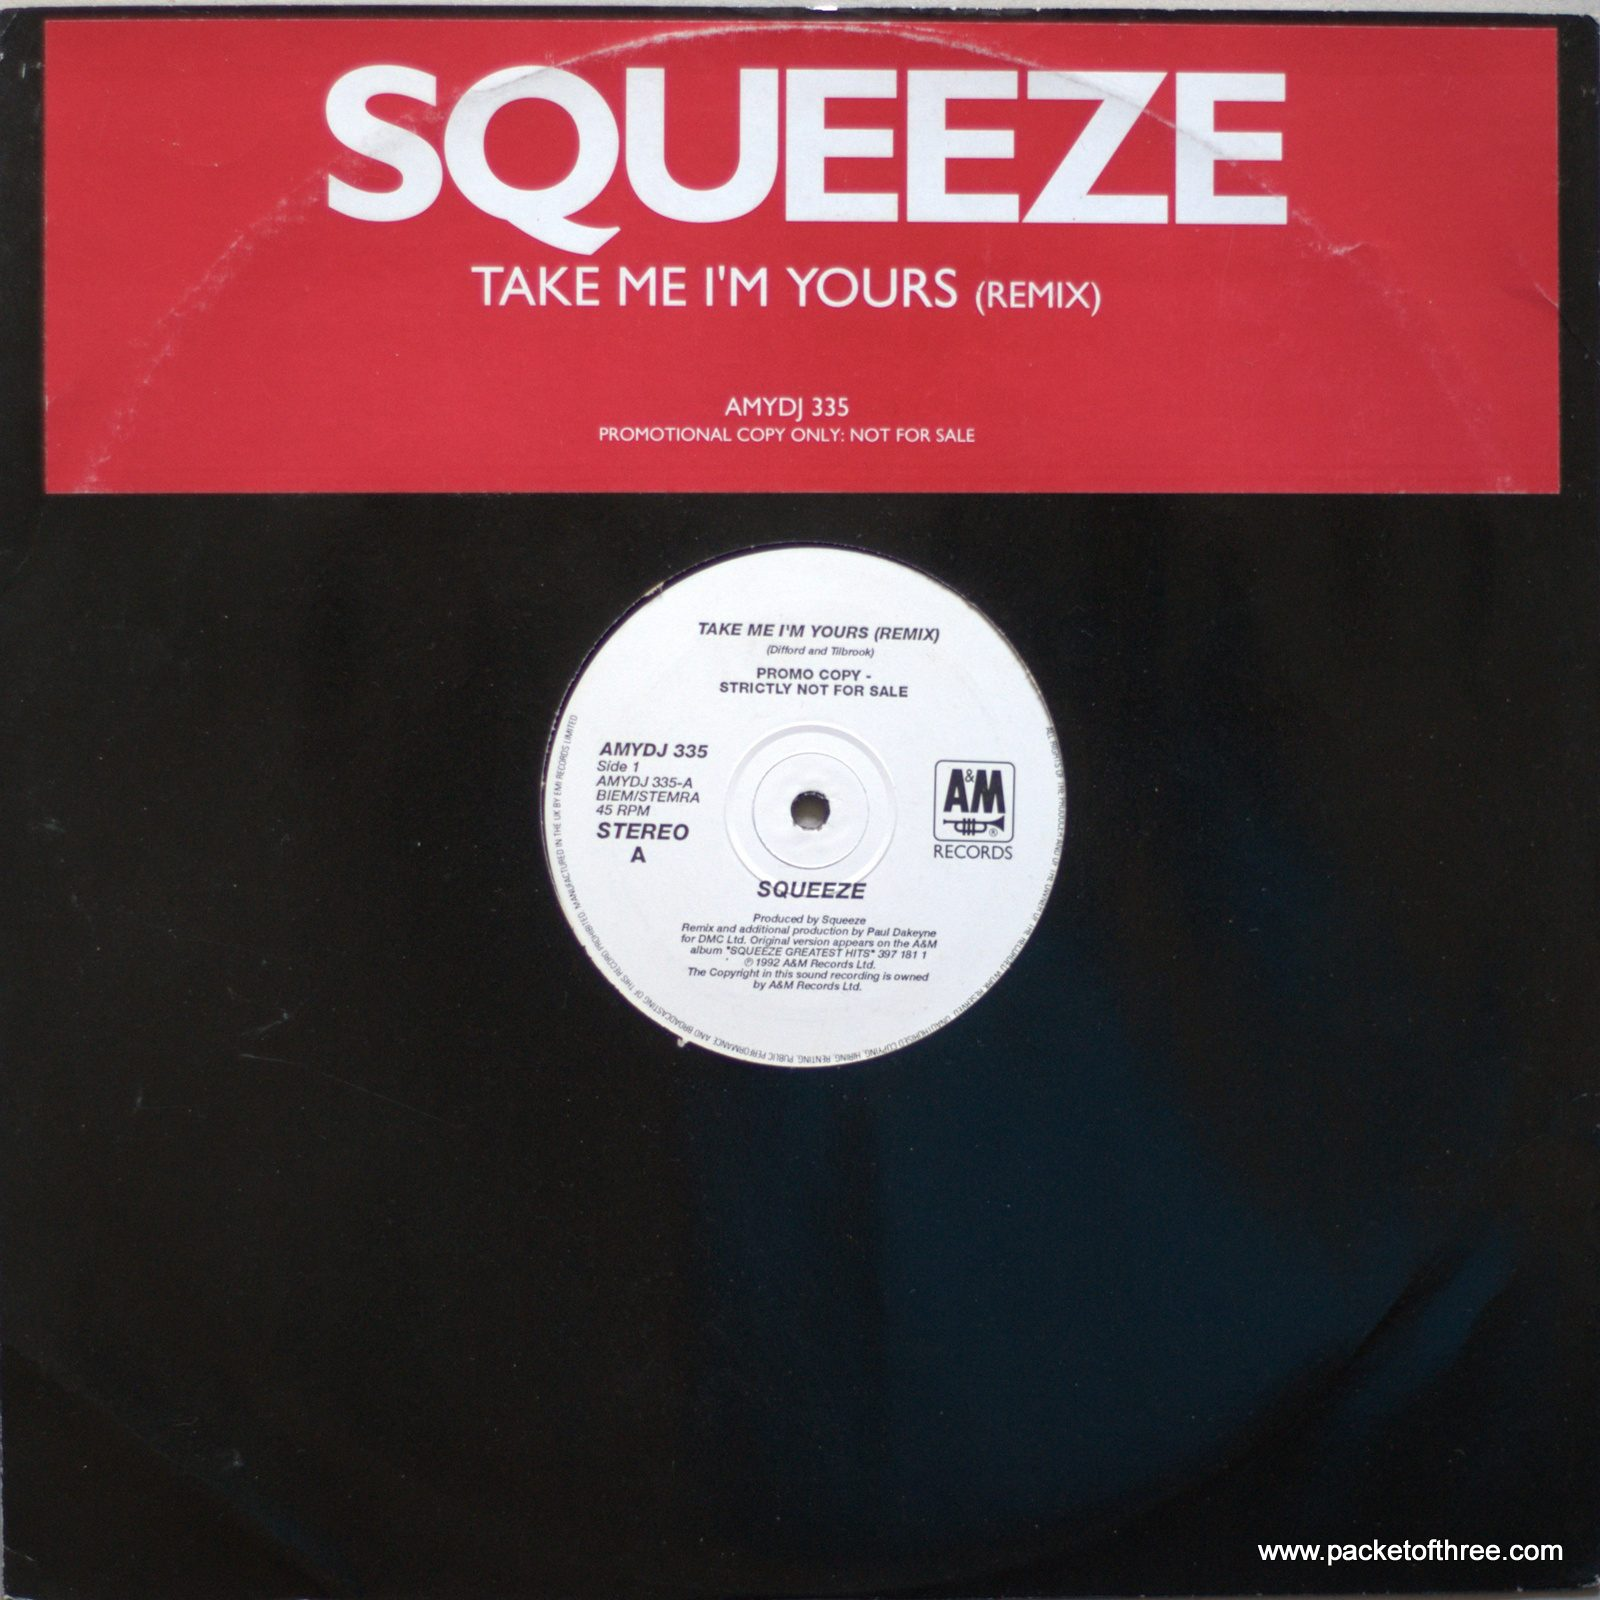 "Take Me I'm Yours - UK - 12"" Promo Remix"